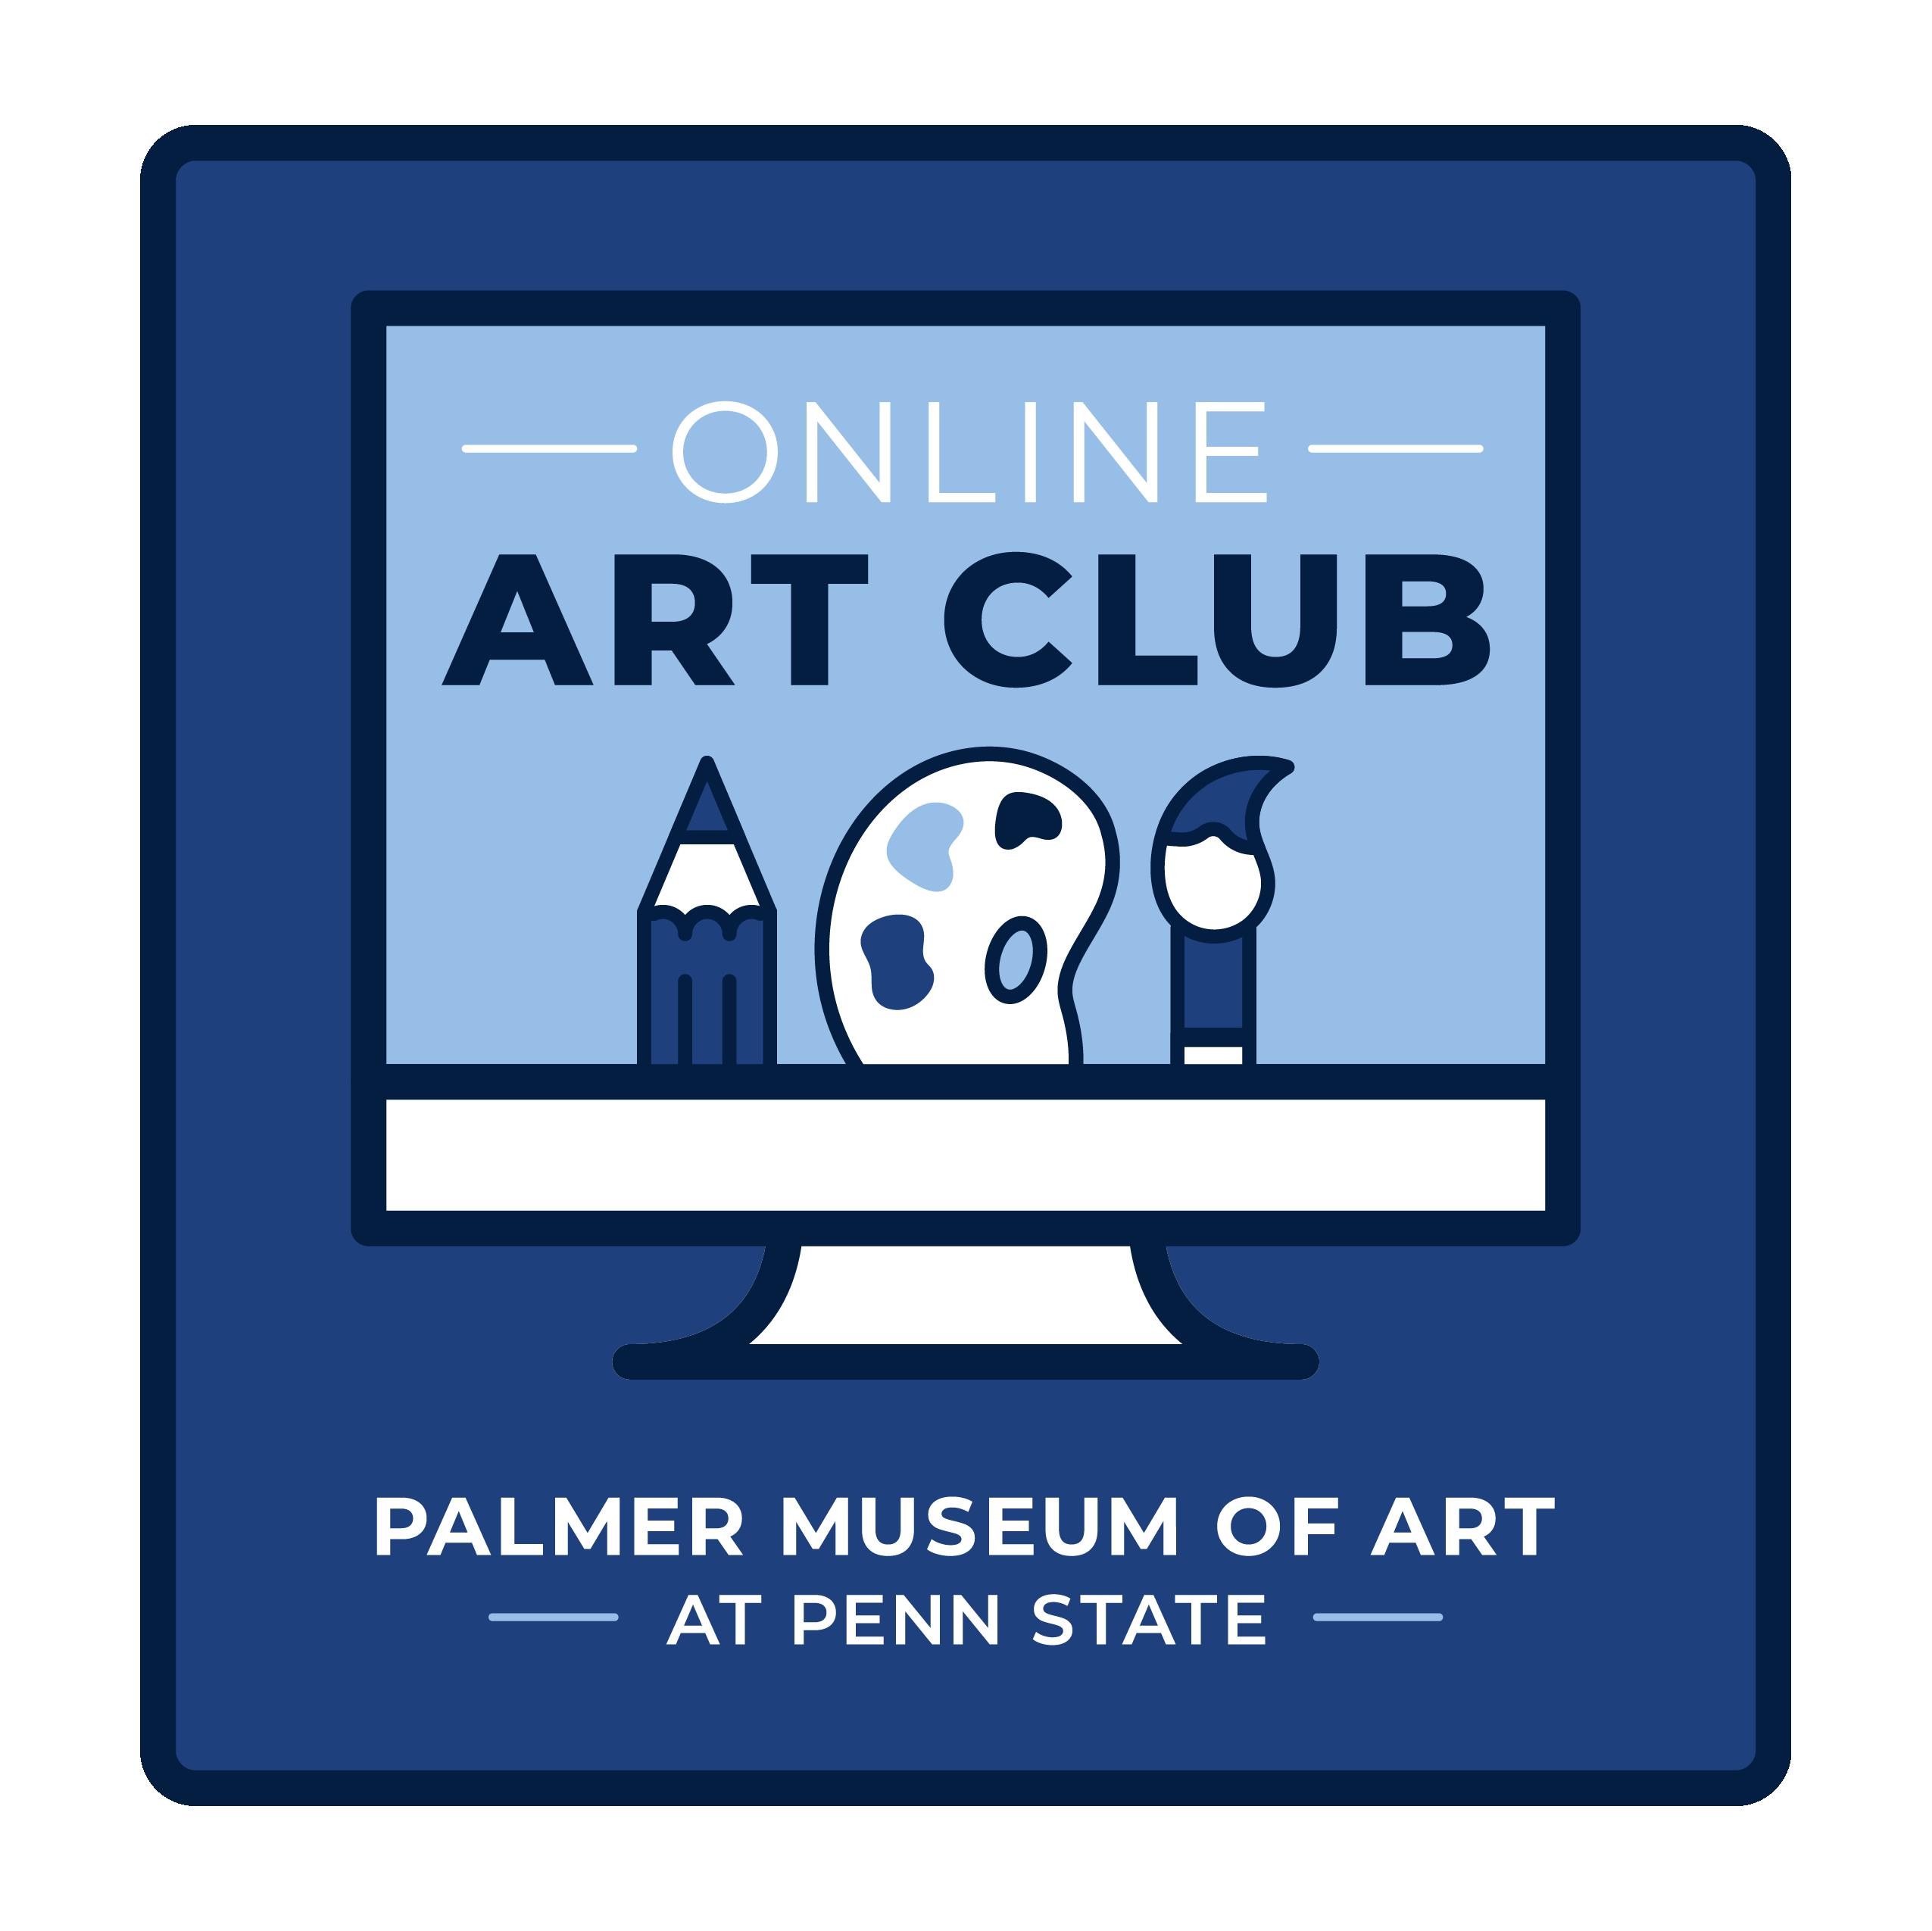 Online Art Club logo